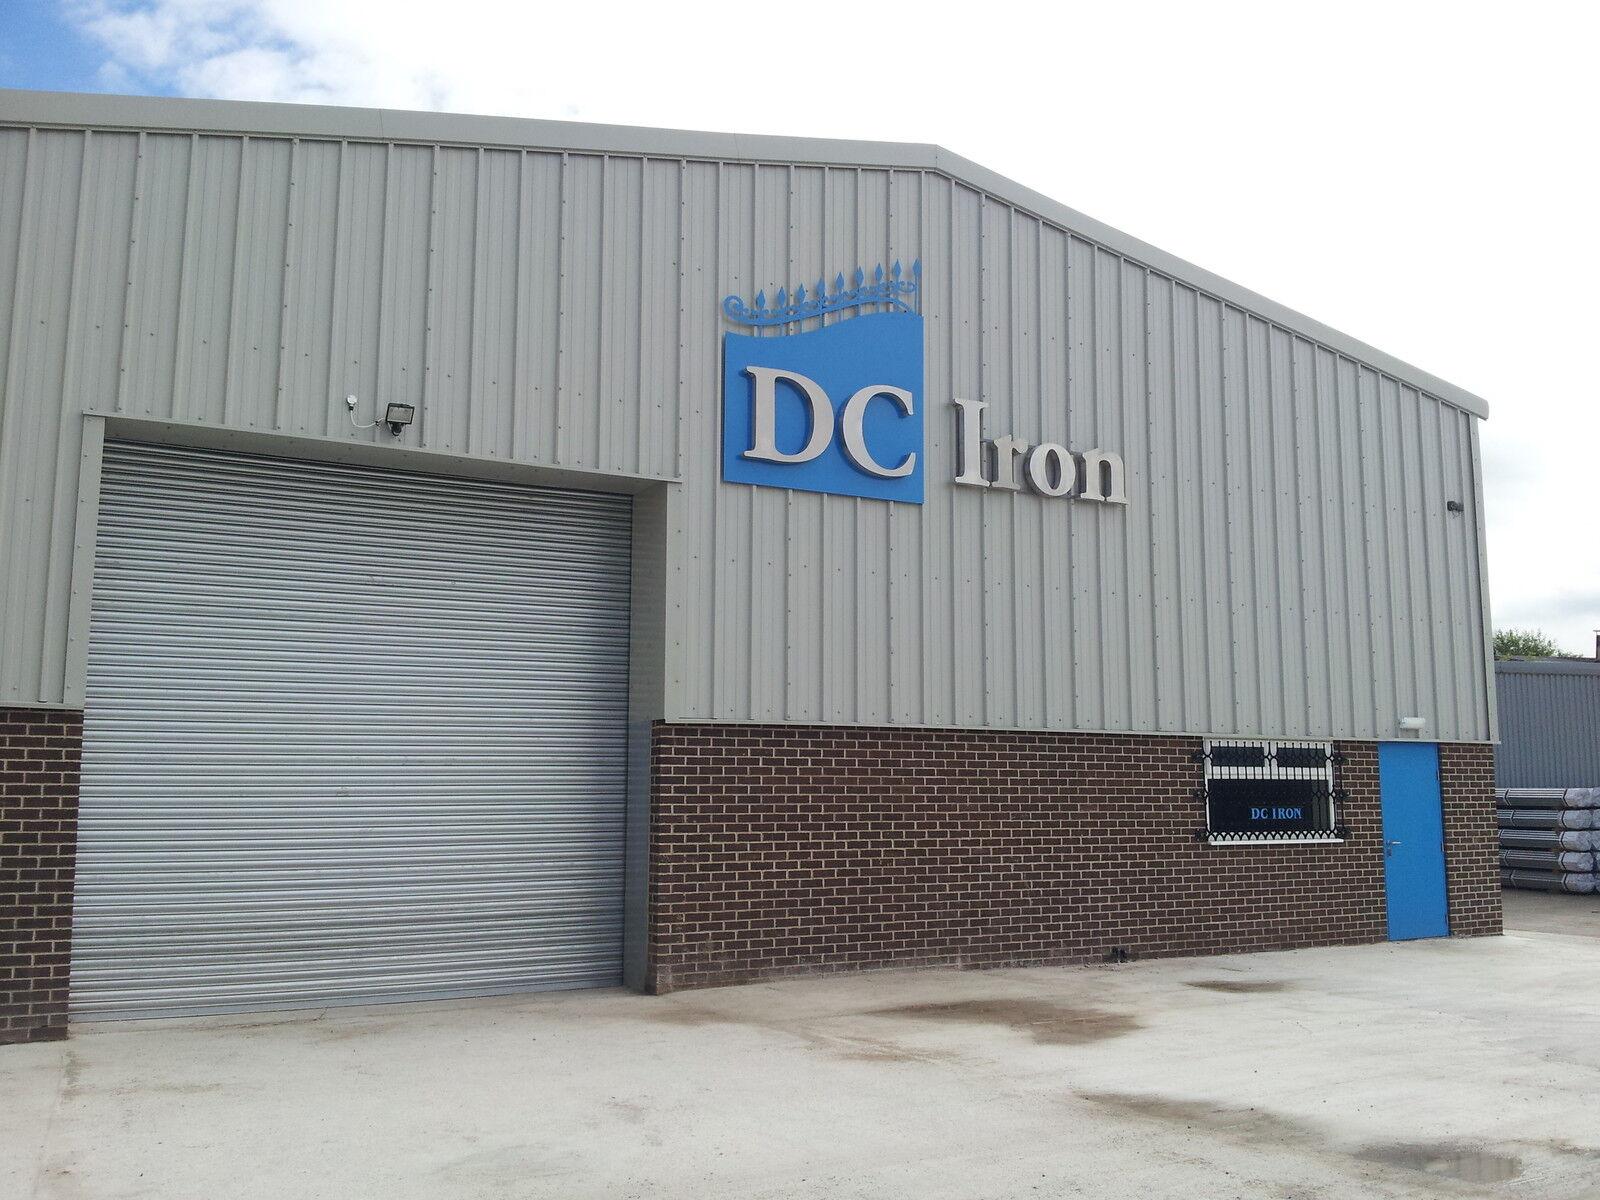 DC Iron